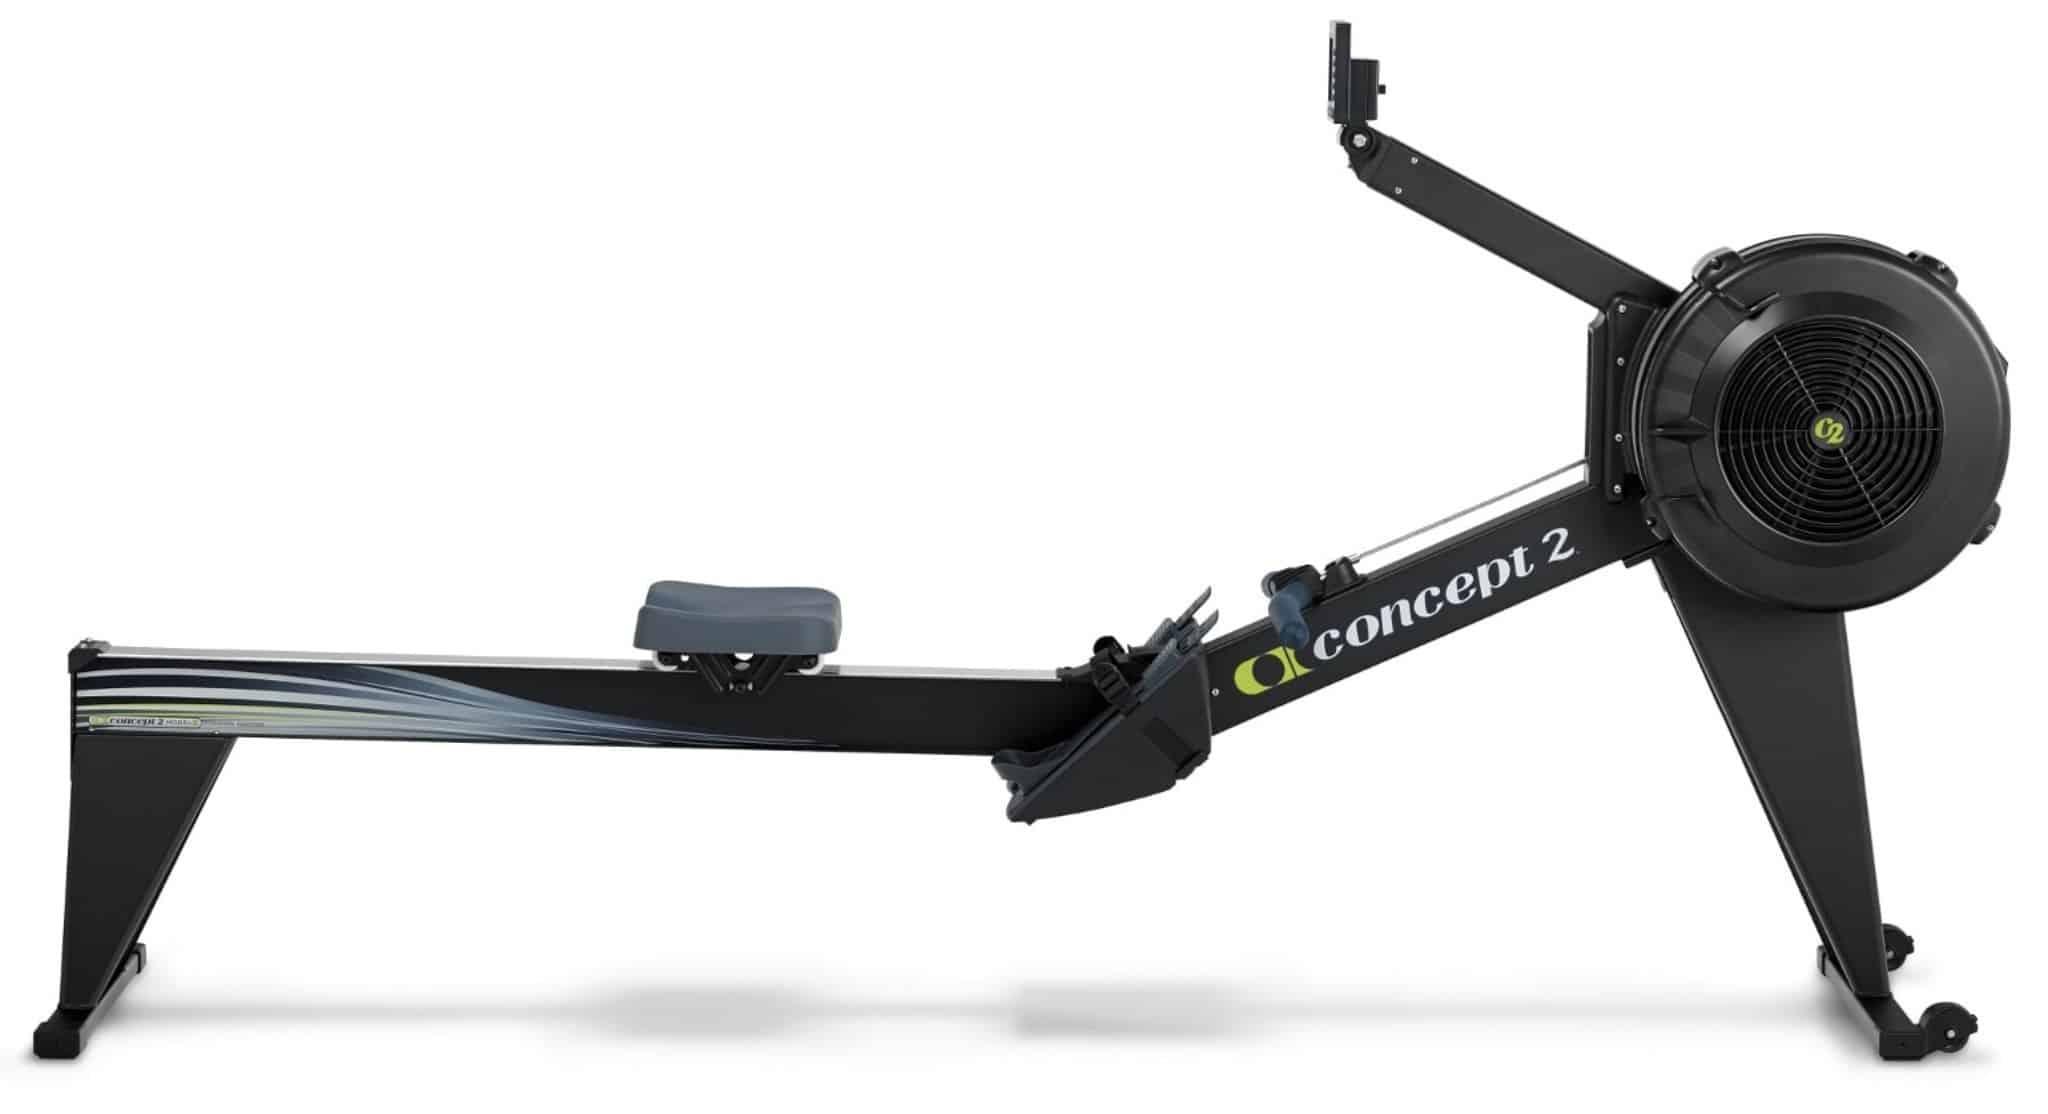 Concept2 Model E Rower Review